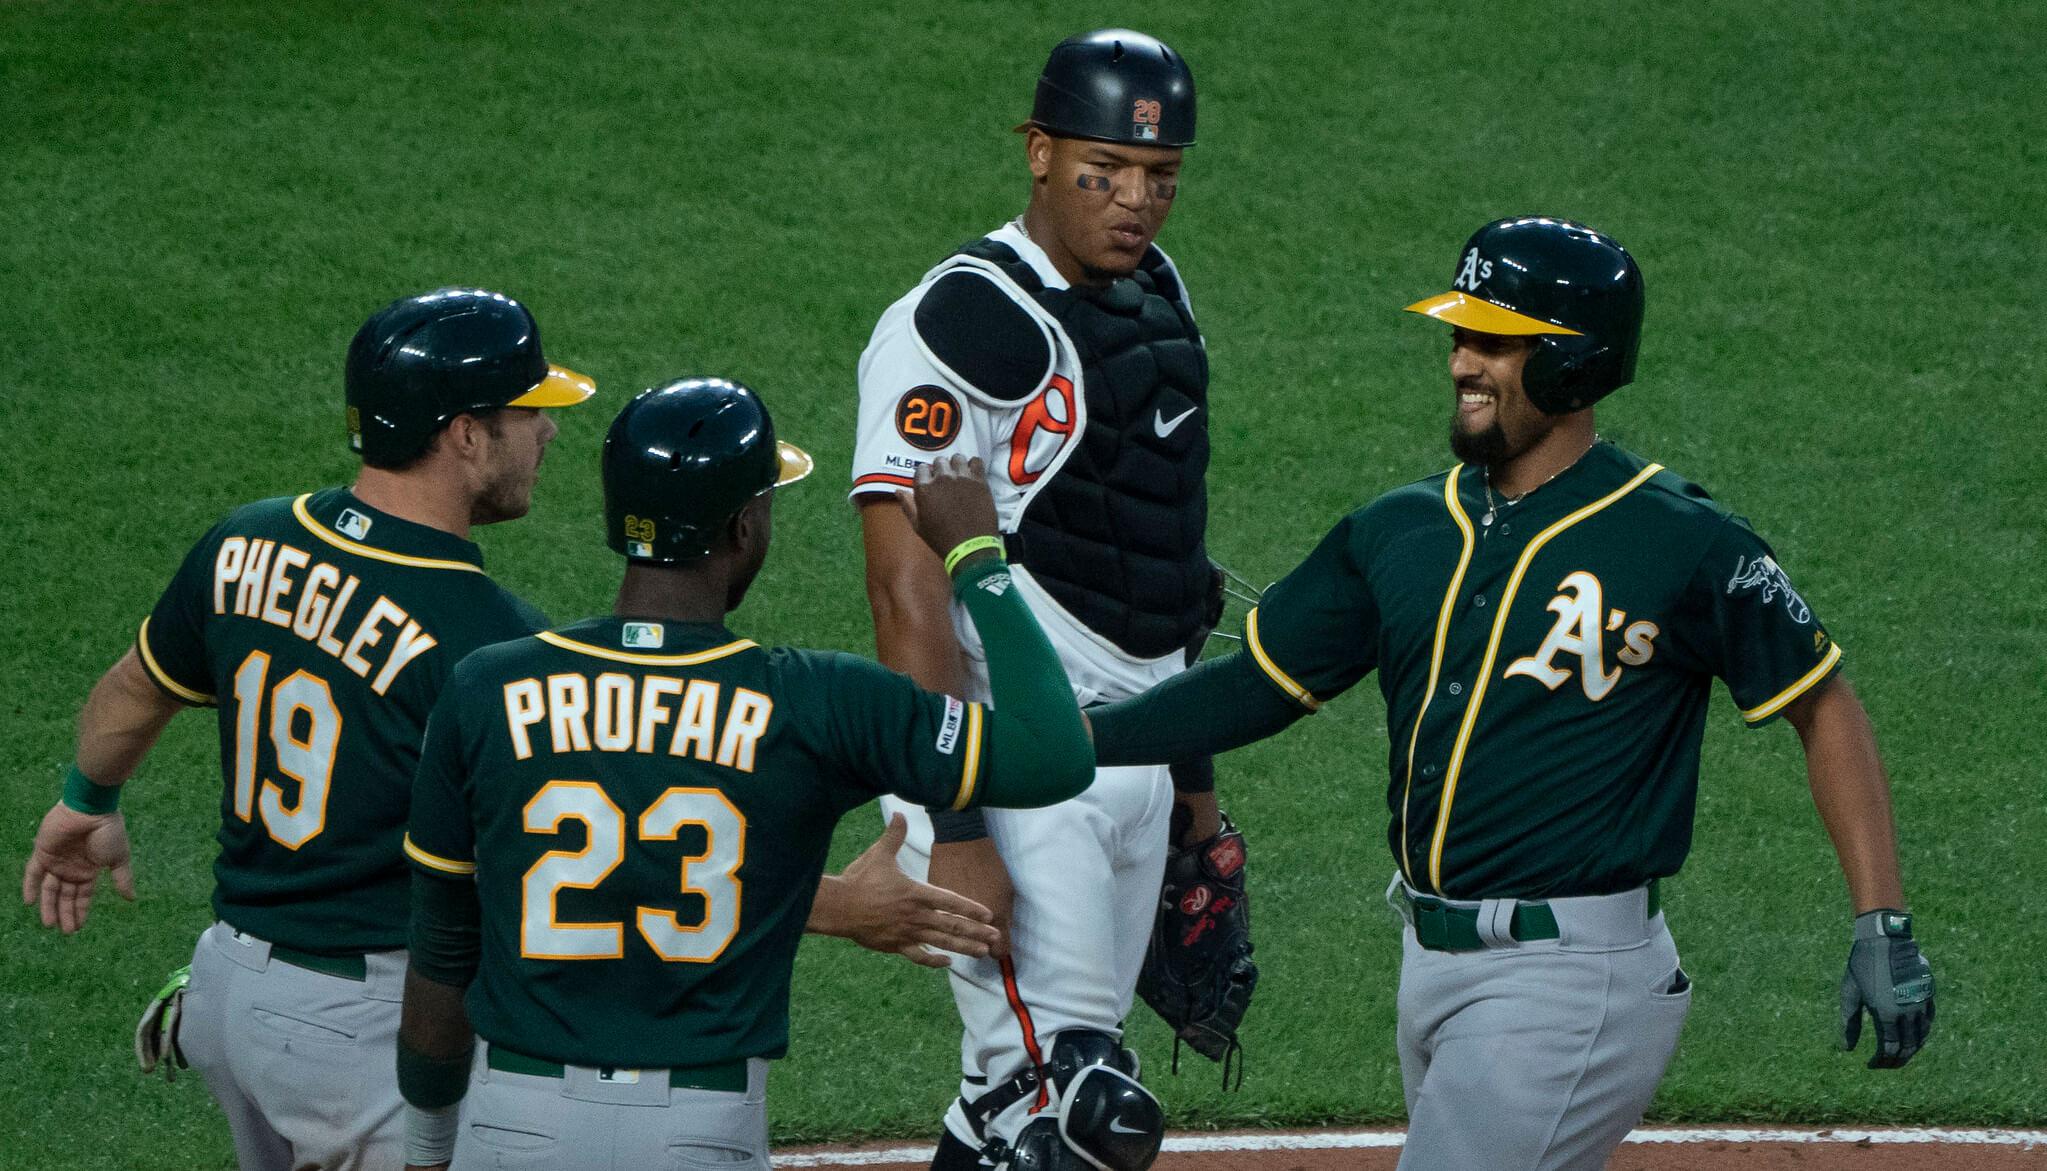 Oakland Athletics baseball players